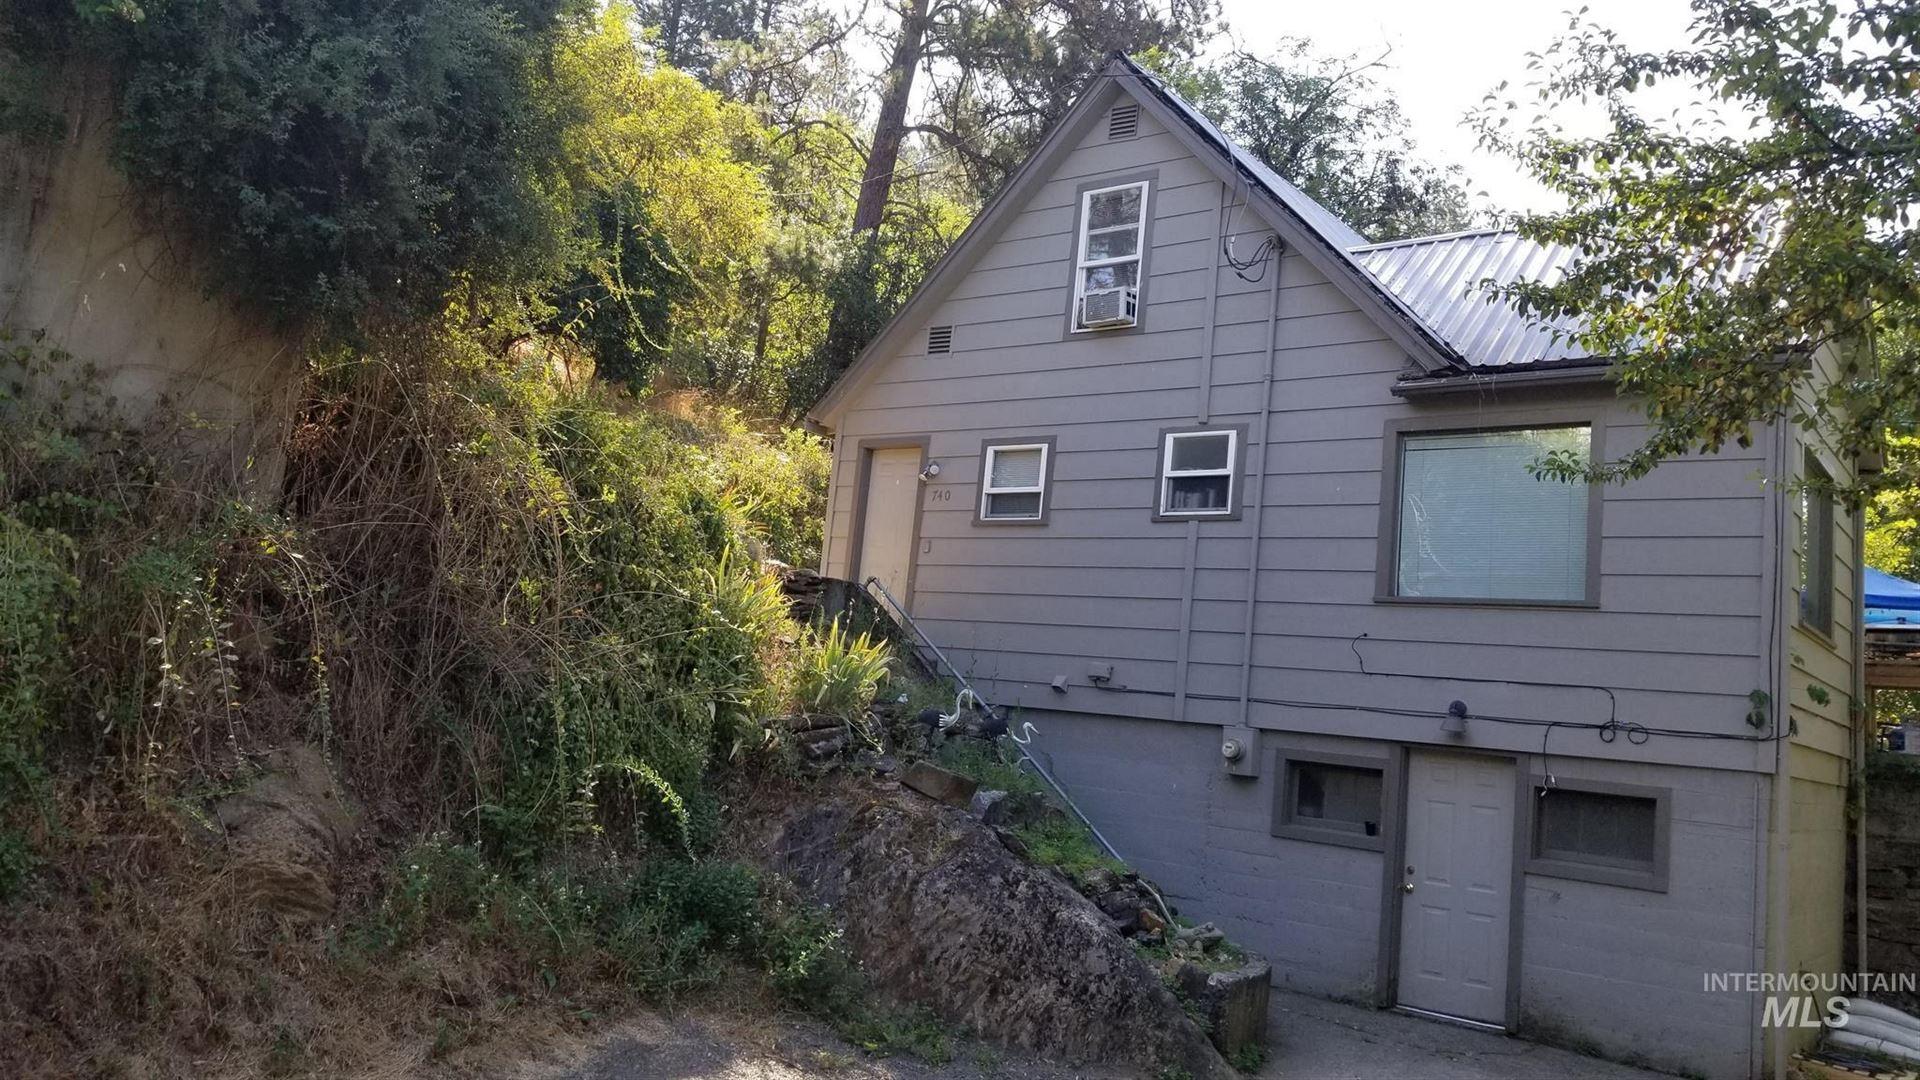 Photo of 740 Holzey Drive, Orofino, ID 83544 (MLS # 98776202)